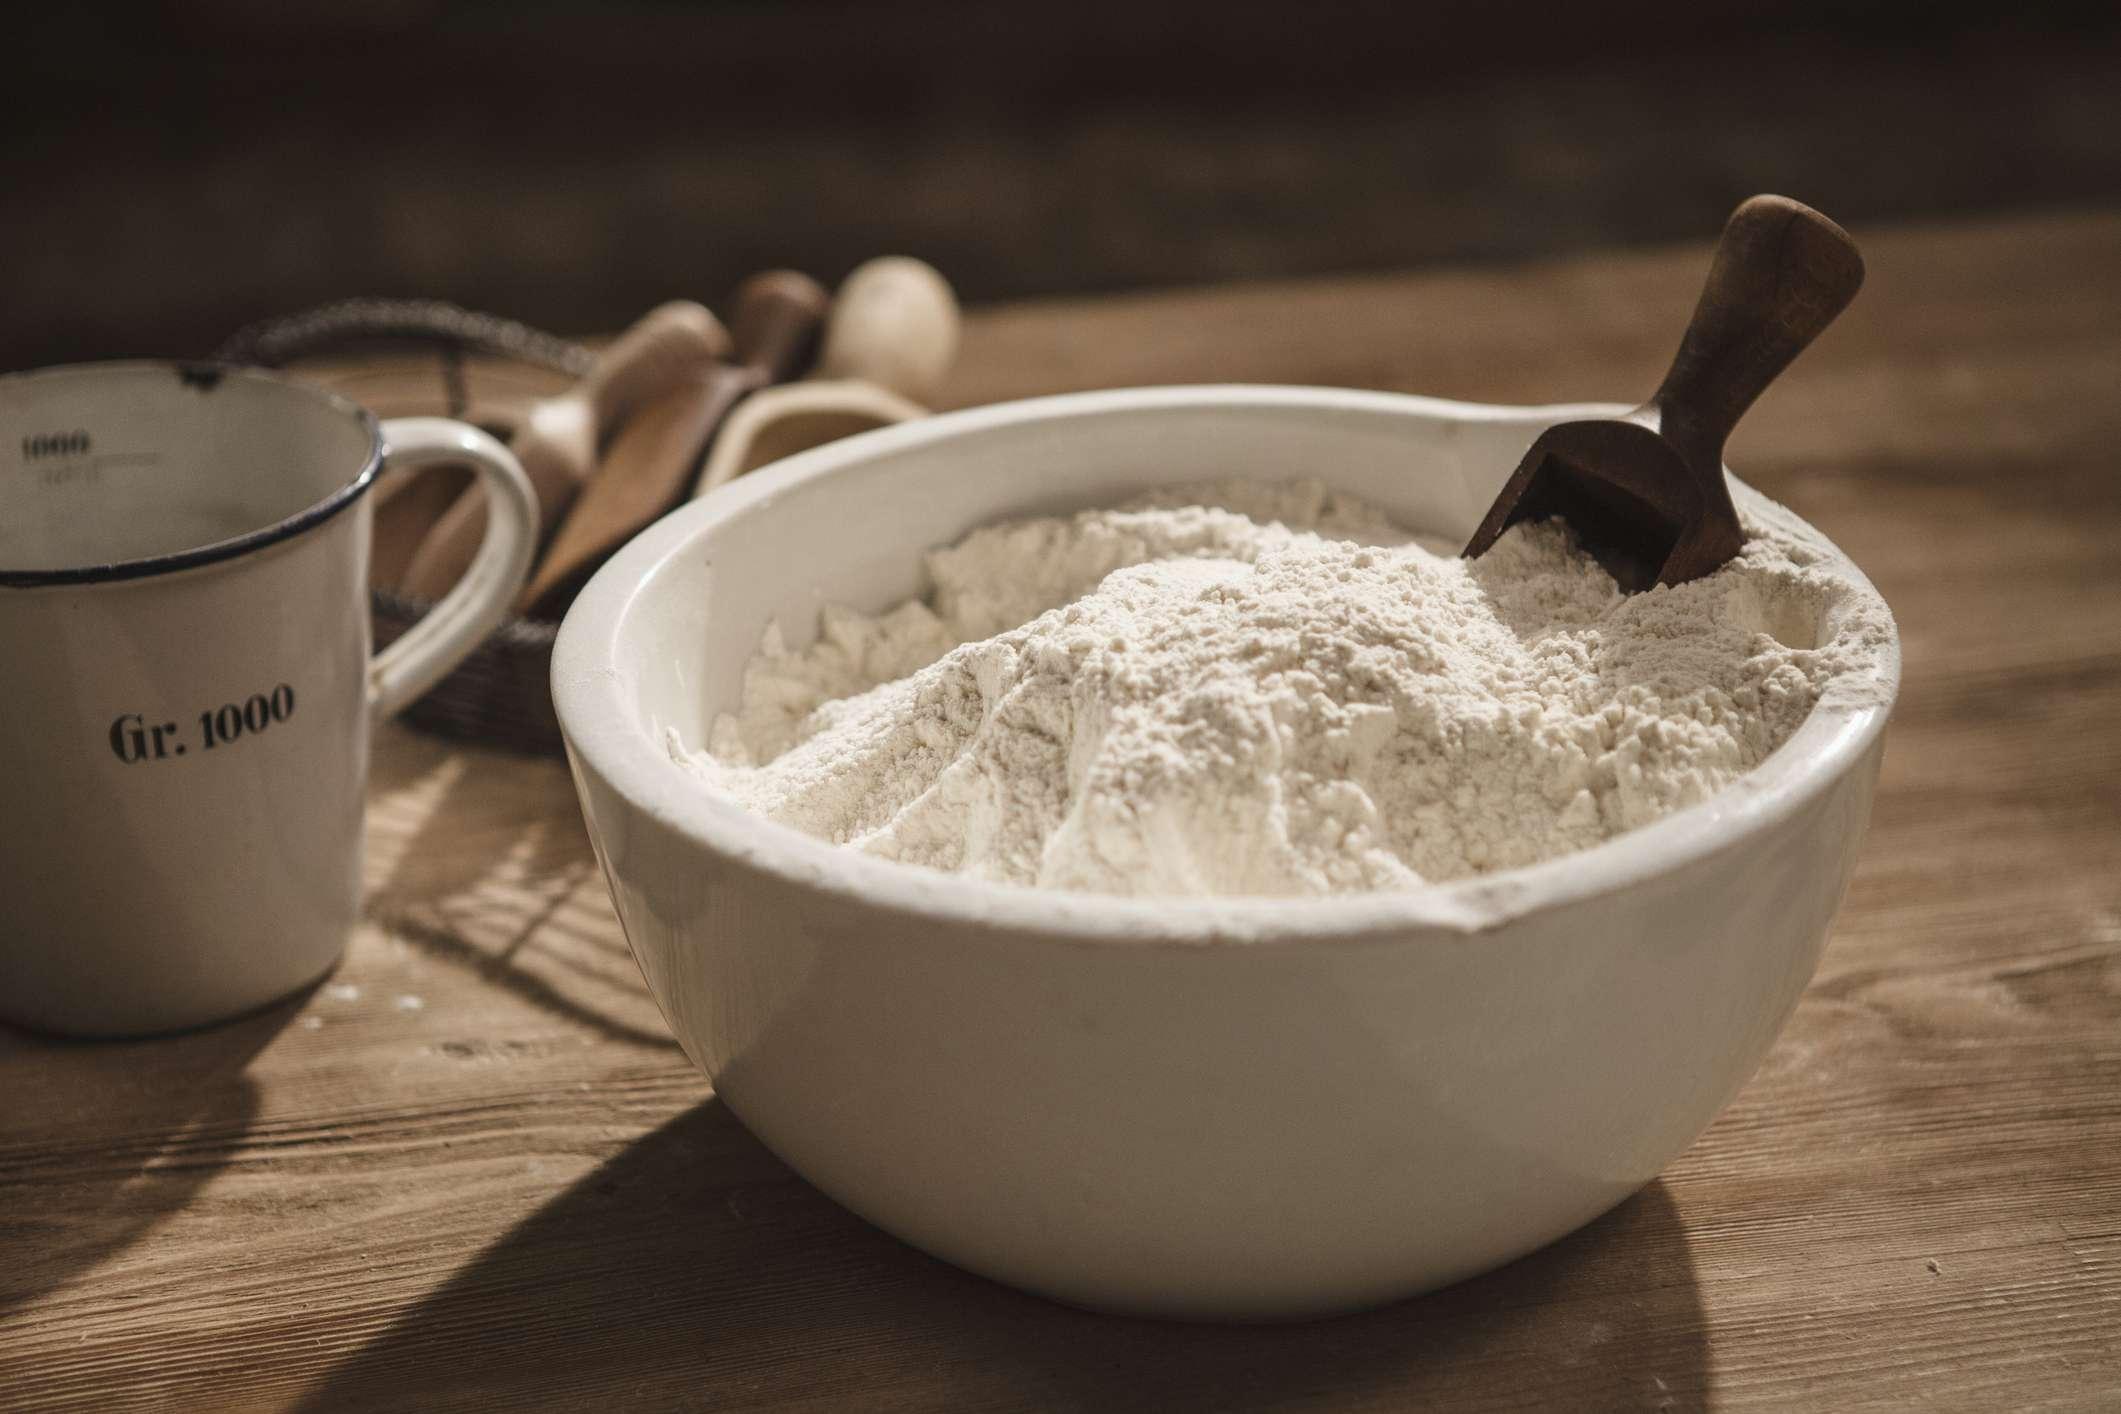 Bowl of flour